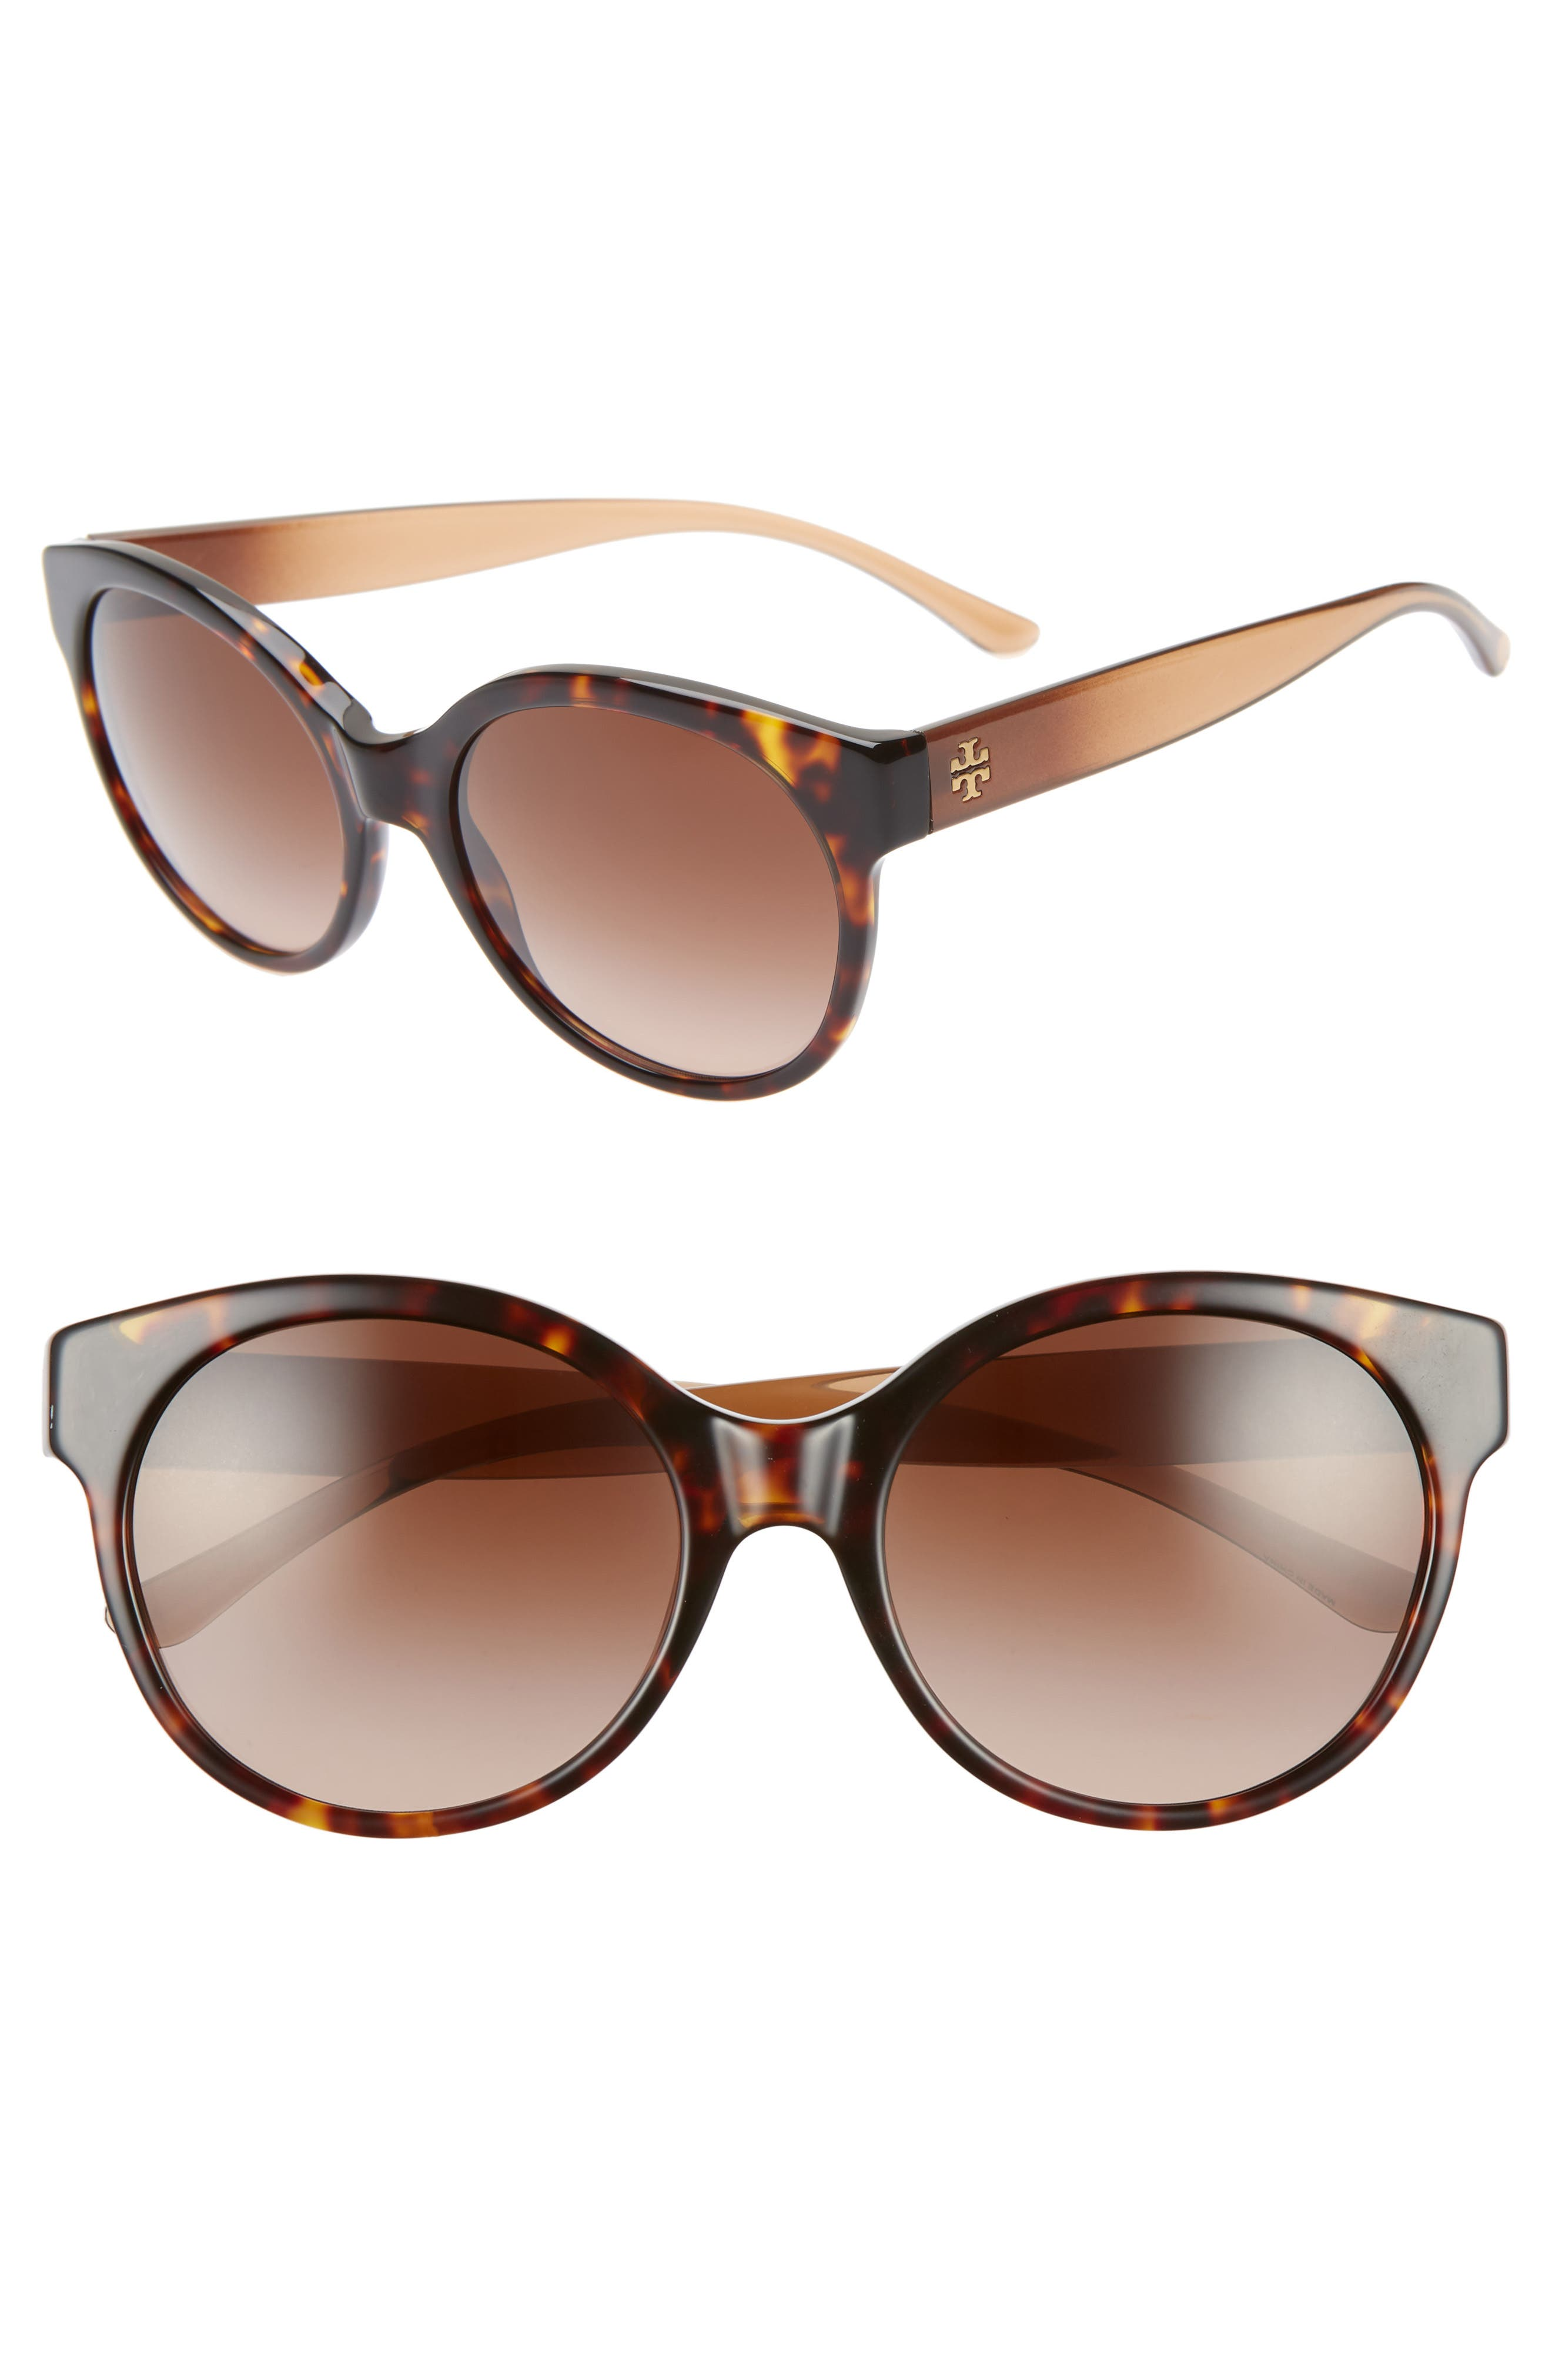 e85915142dc5 Tory Burch Stacked T 55Mm Round Sunglasses - Dark Tortoise/ Brown Gradient